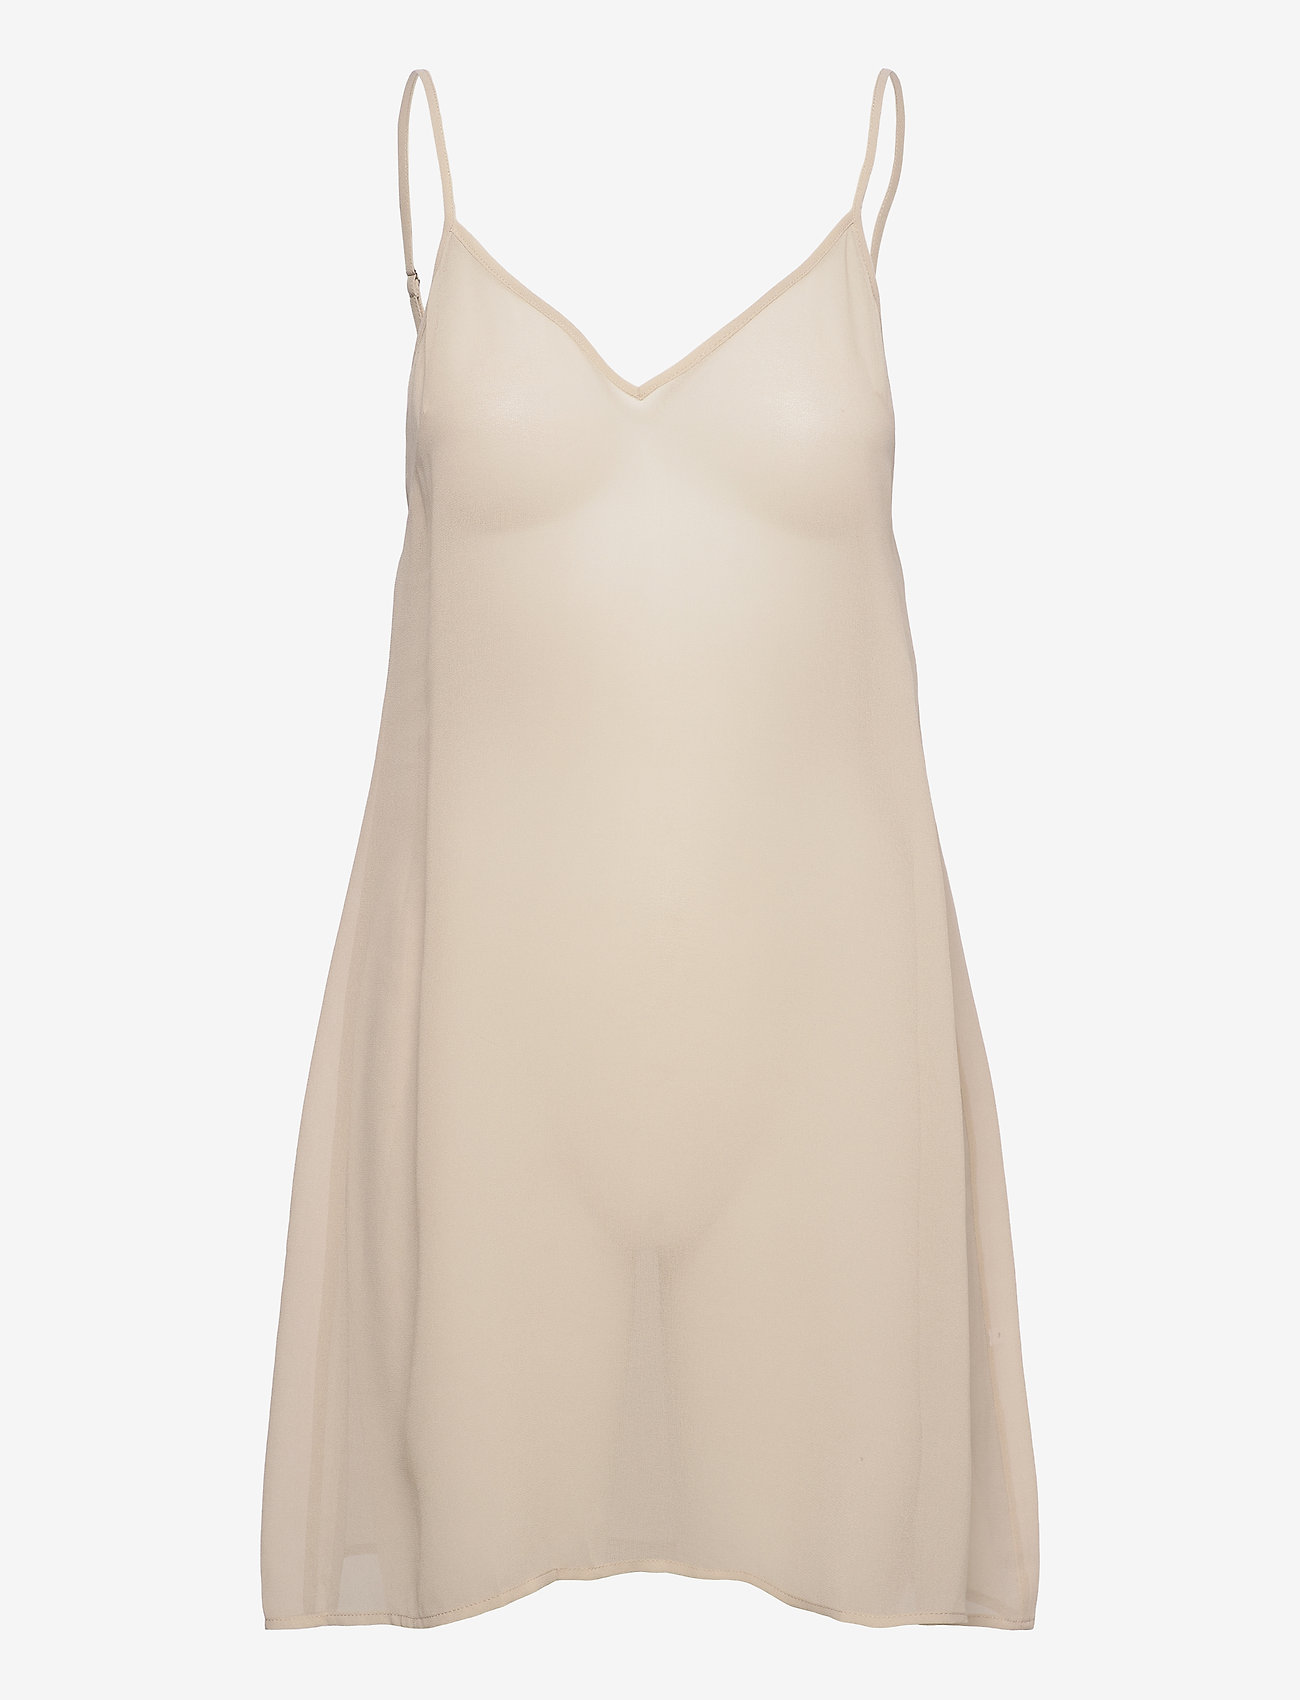 Samsøe Samsøe - Jolie short dress 12697 - summer dresses - quicksand - 2